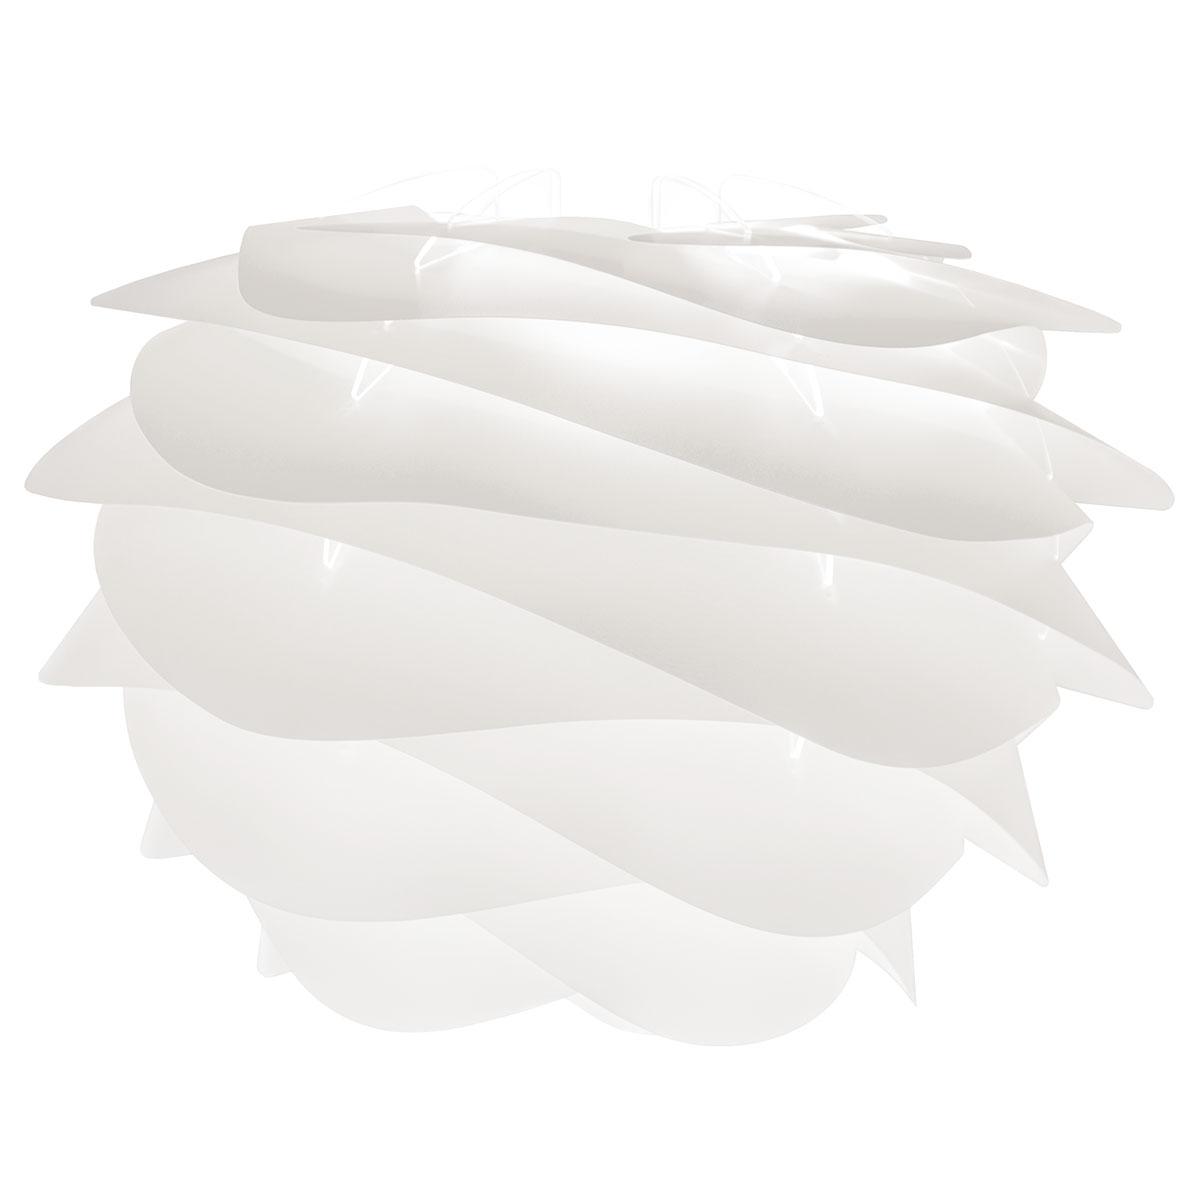 VITA lampeskærm - Carmina - Hvid